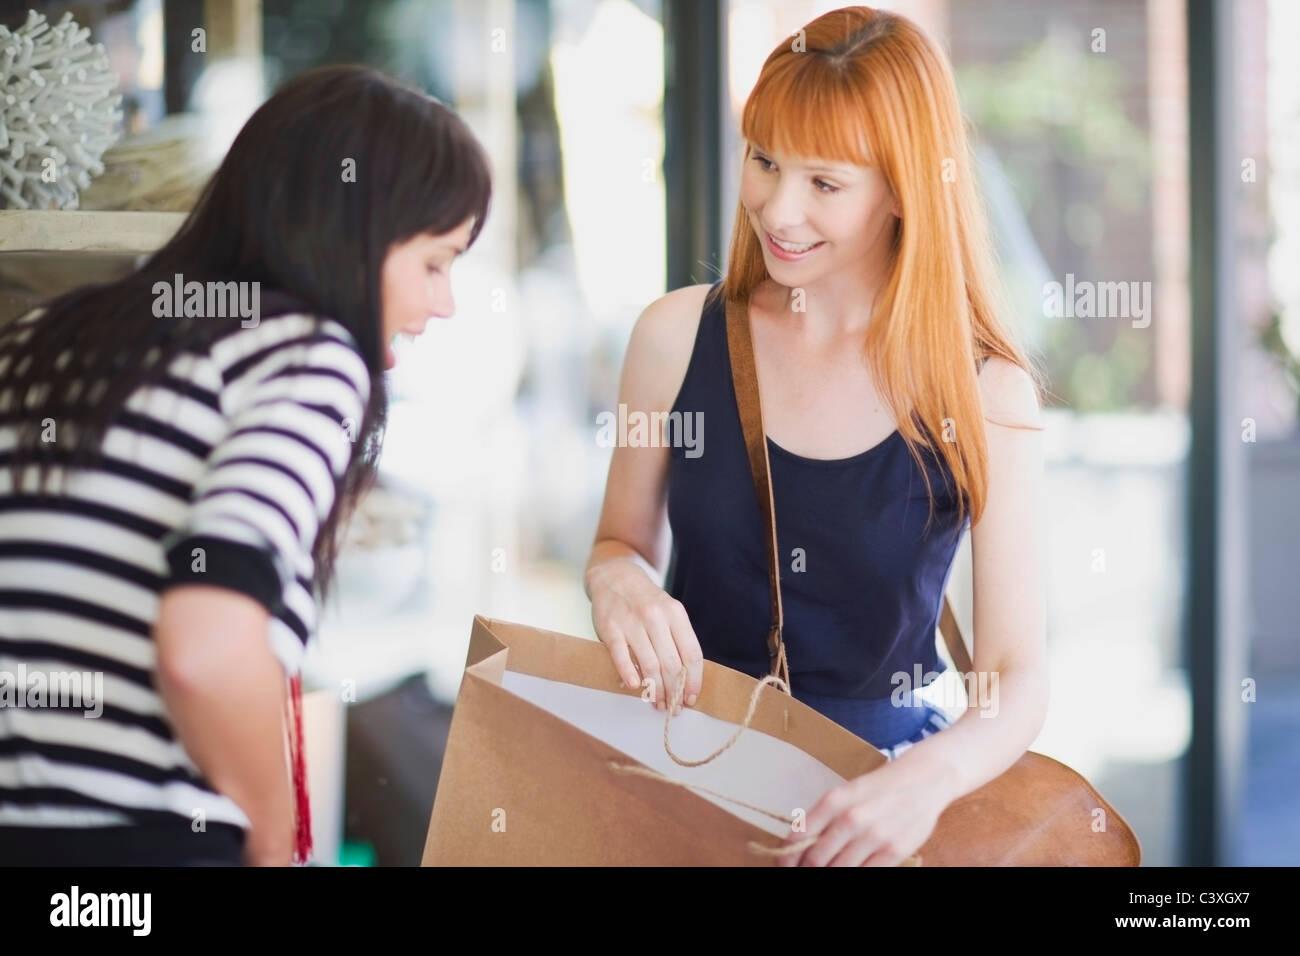 Women on a shopping tour - Stock Image